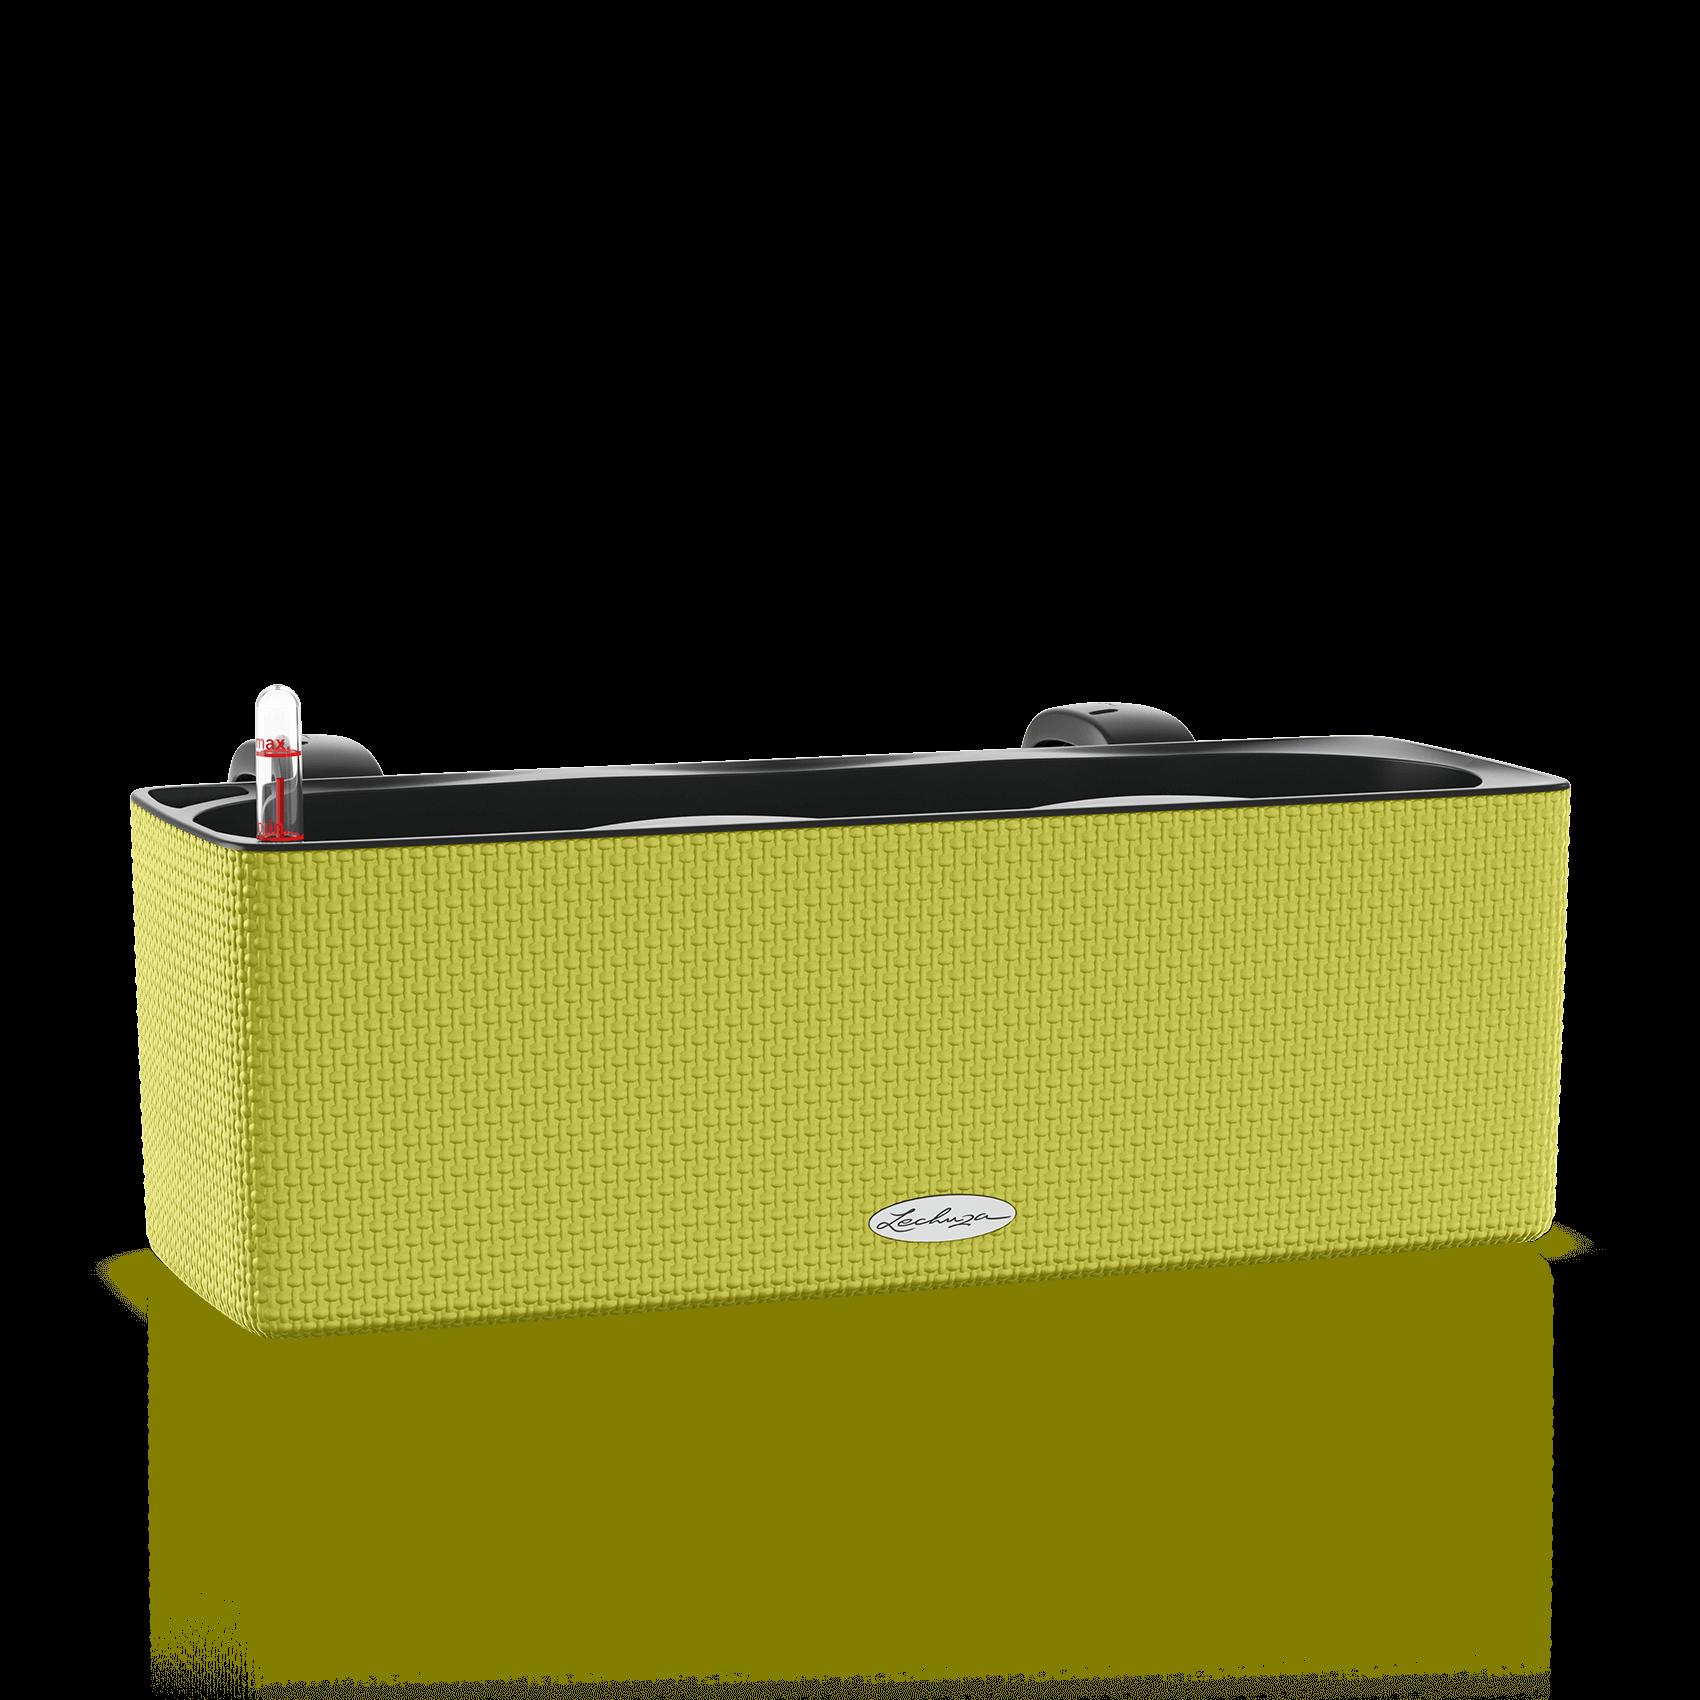 CUBE Color Triple зеленый лайм